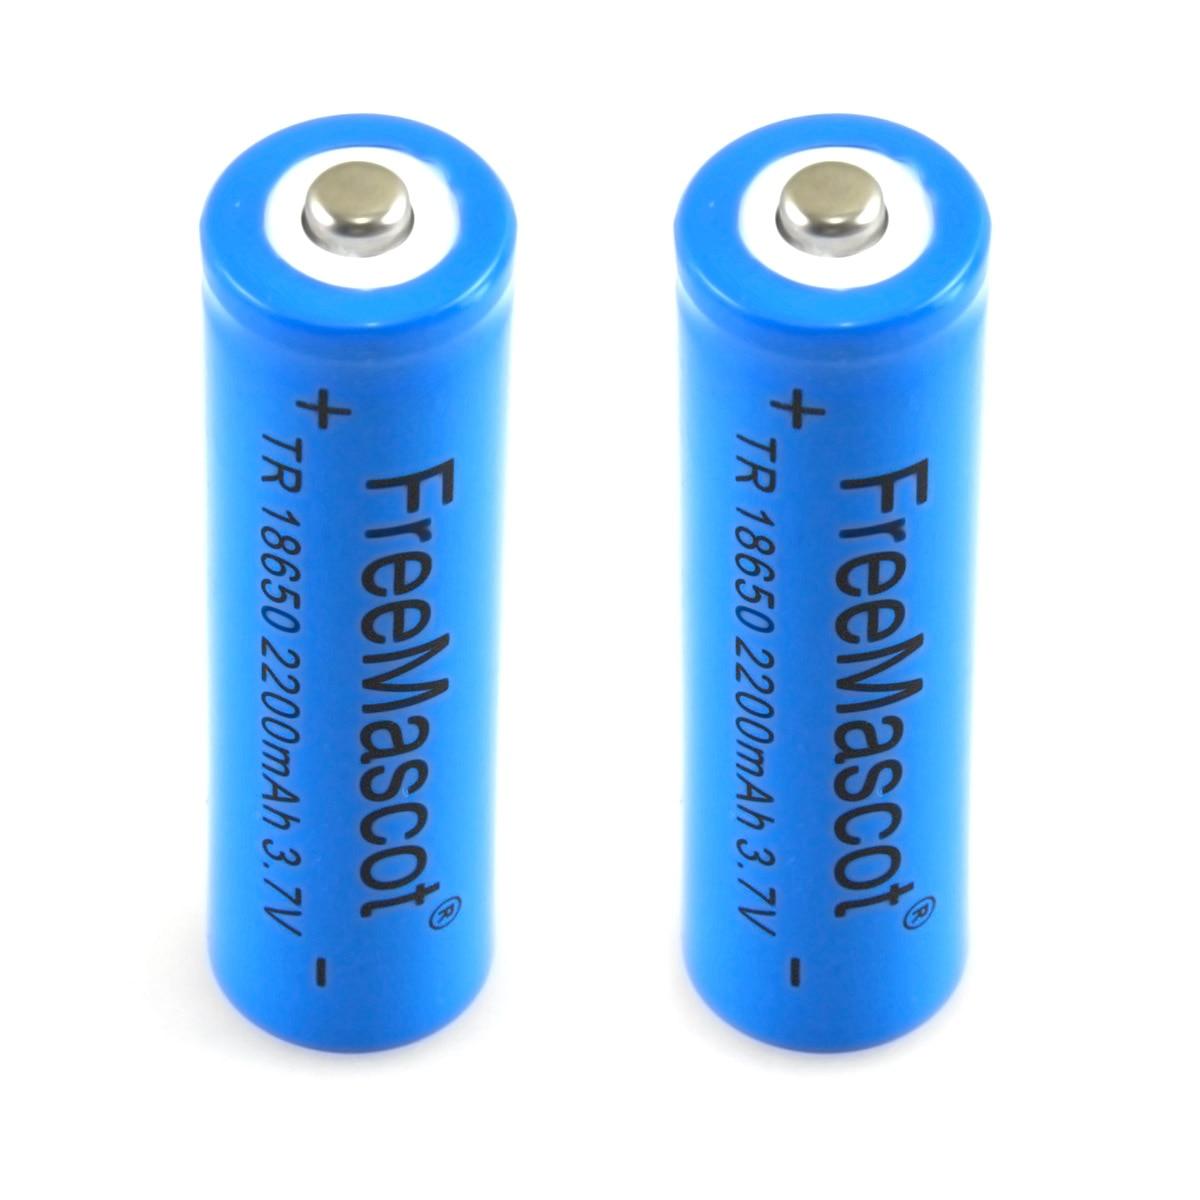 CWLASER FreeMascot 3.7V 2200mAh TR 18650 Rechargeable Li-ion Battery (2 Pcs) (Blue)